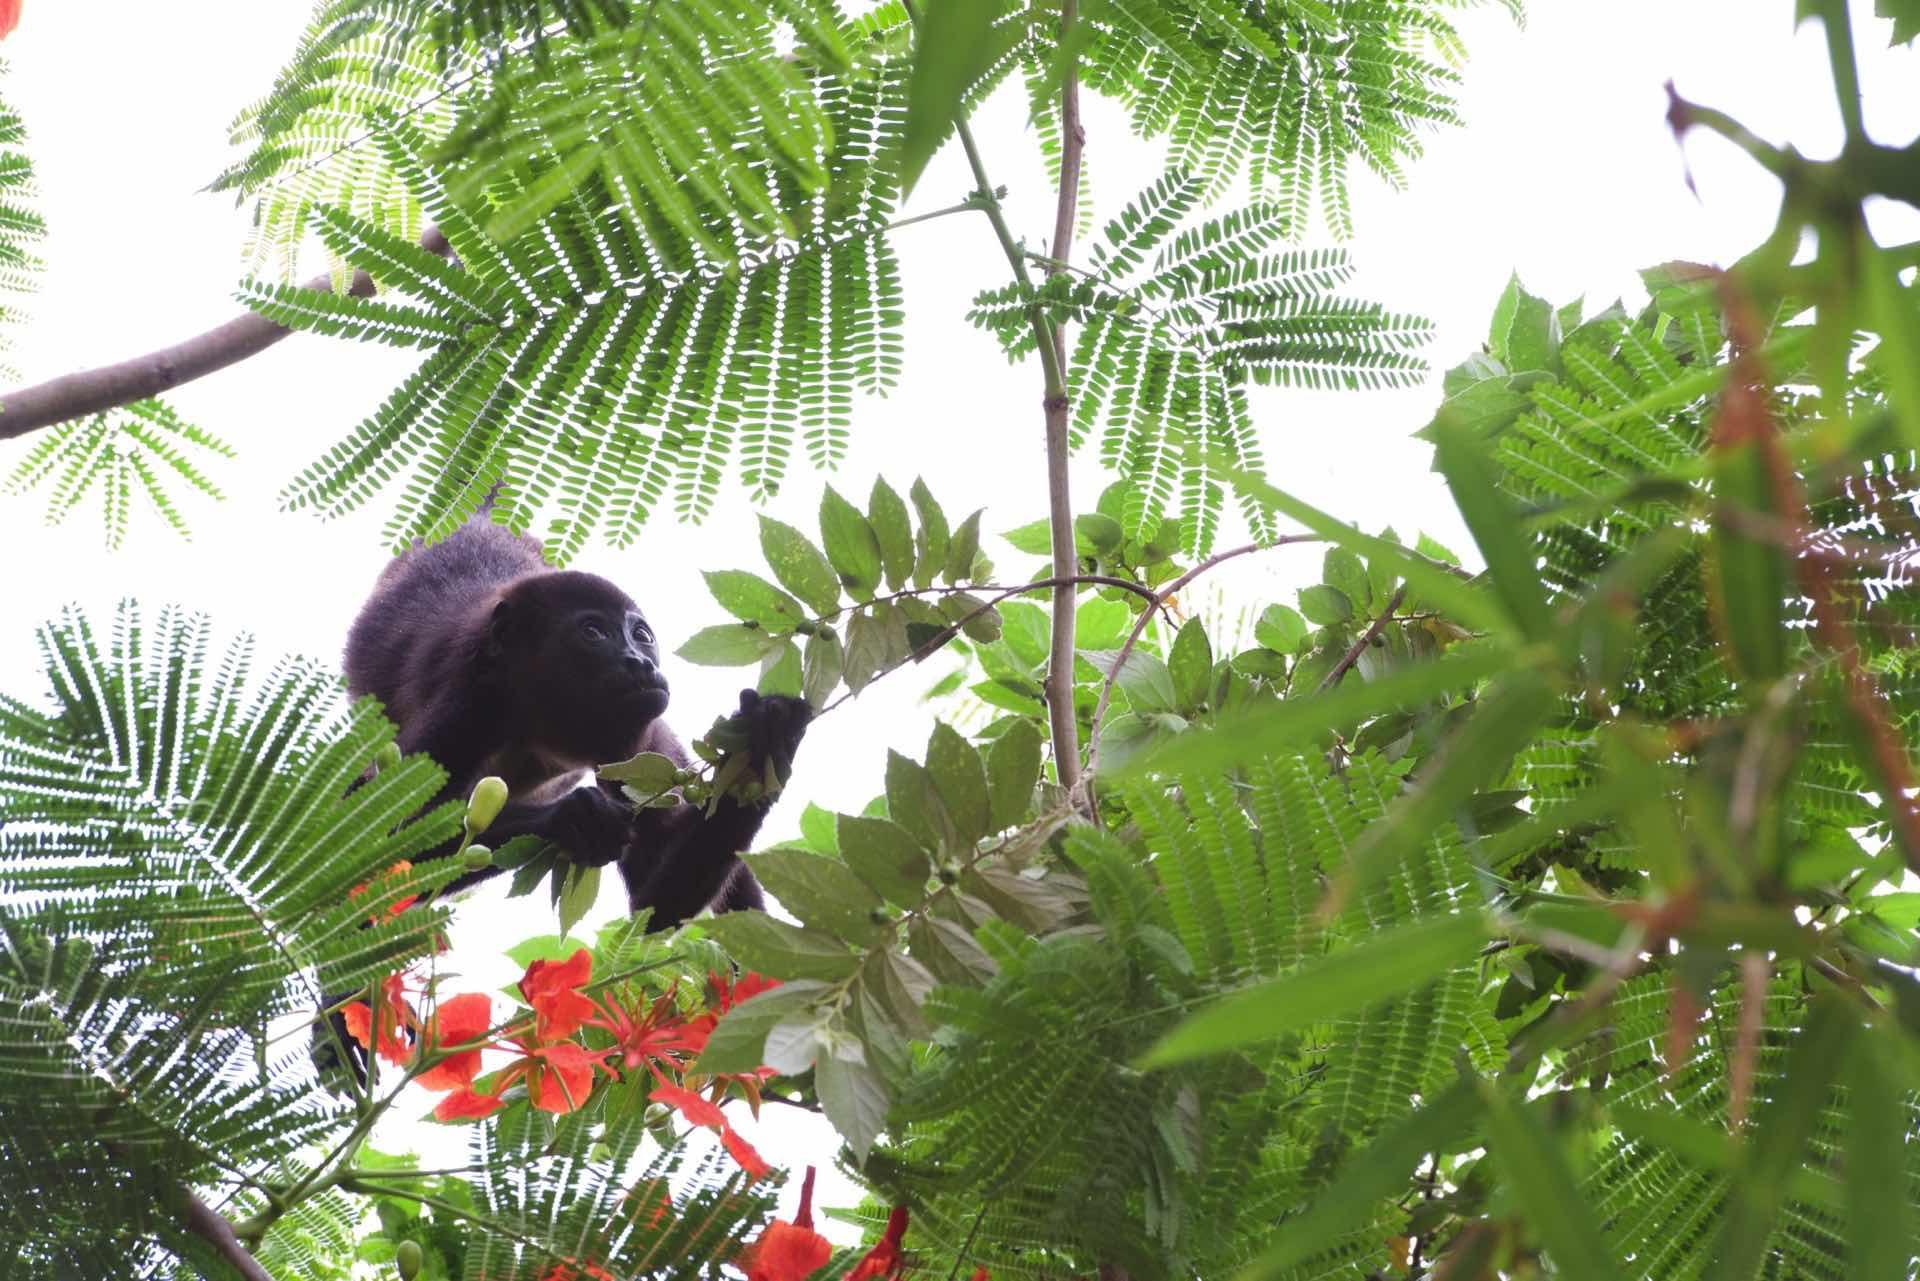 Howler Monkeys in the trees at Casa de Luz